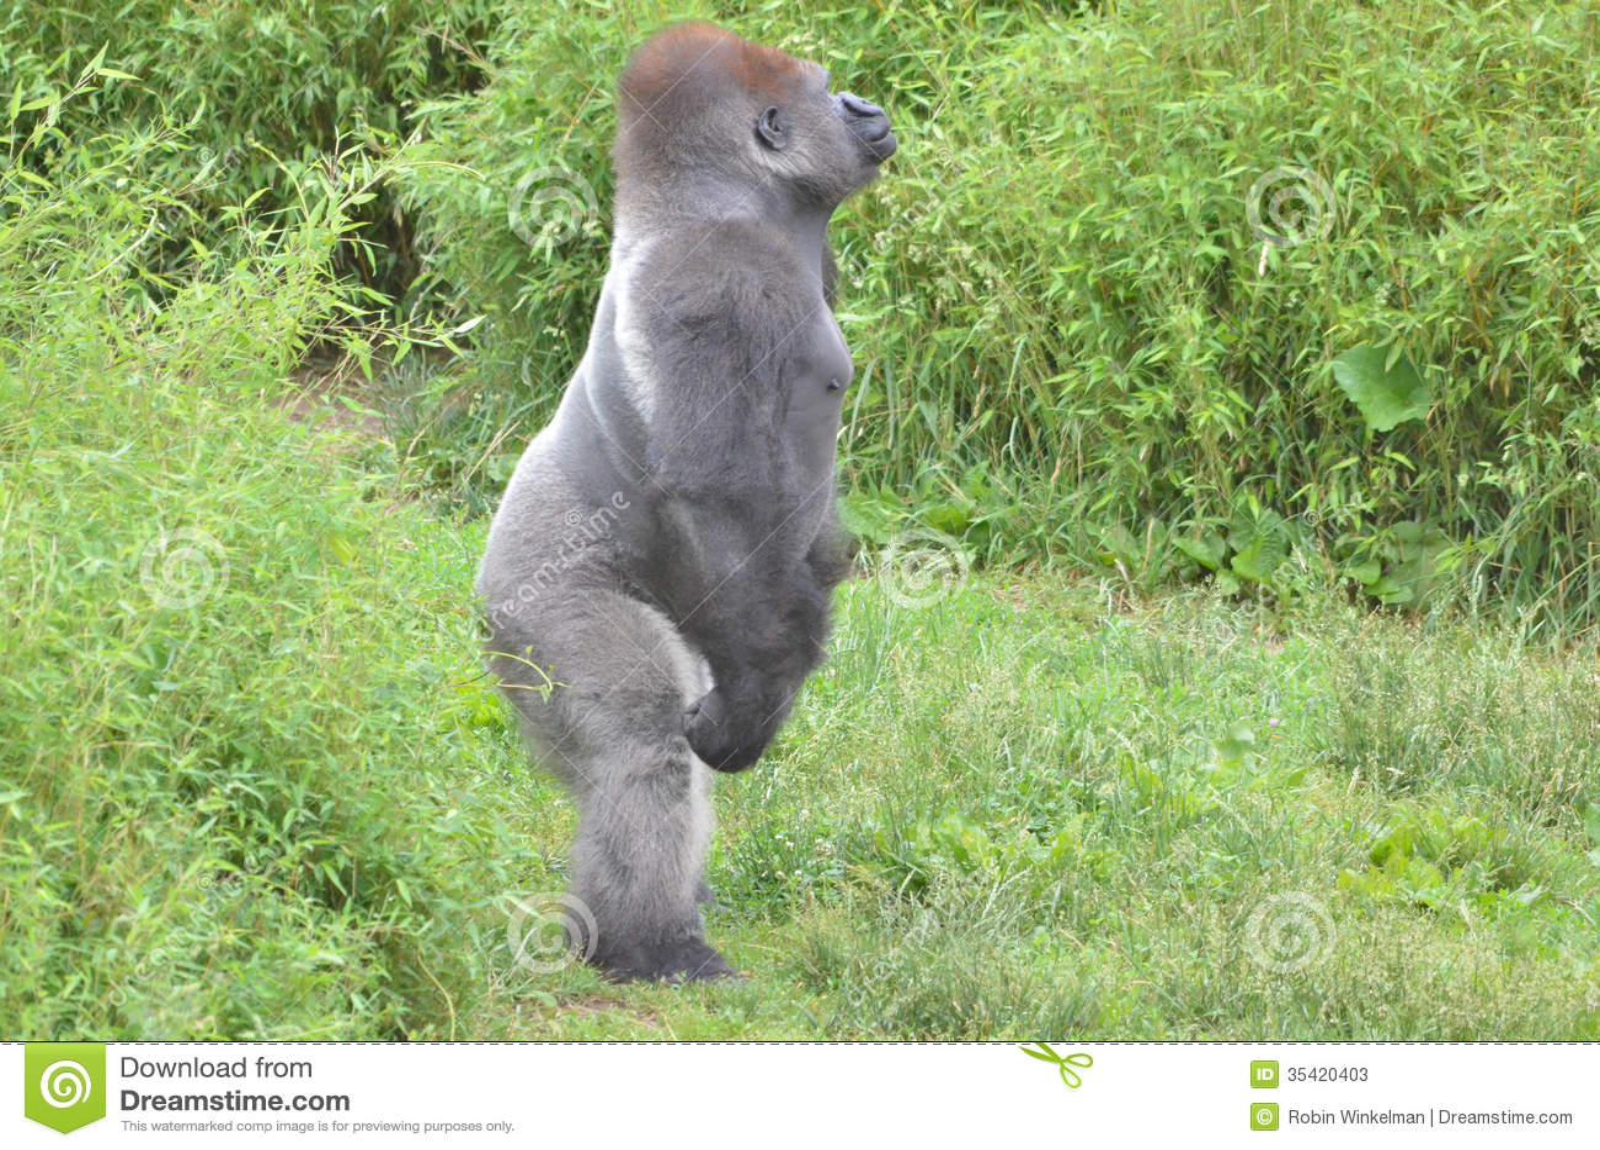 Standing Gorilla Stock Photos - Image: 35420403